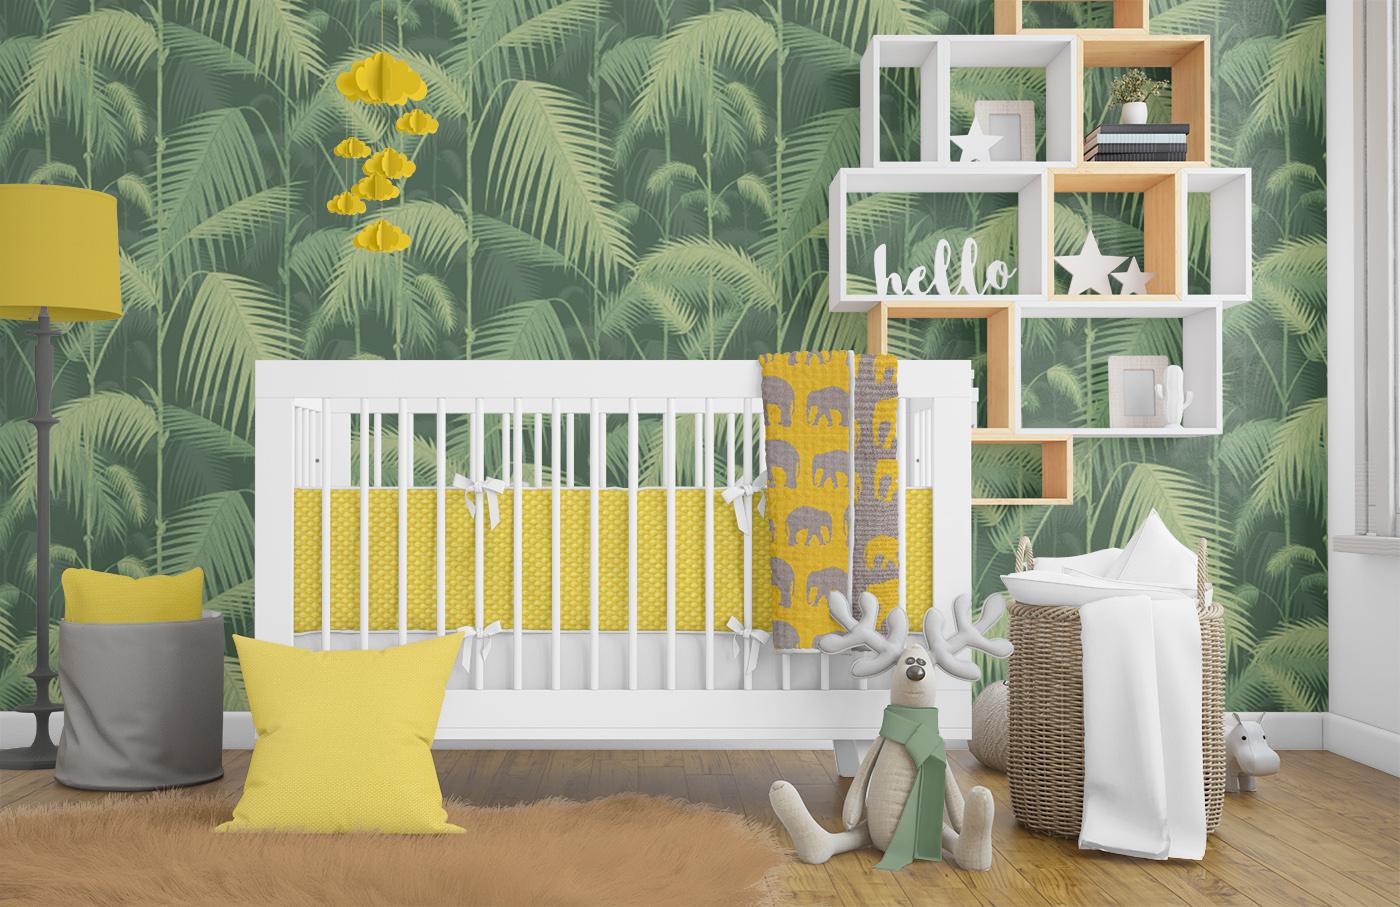 Jungle Nursery Theme Decor Ideas